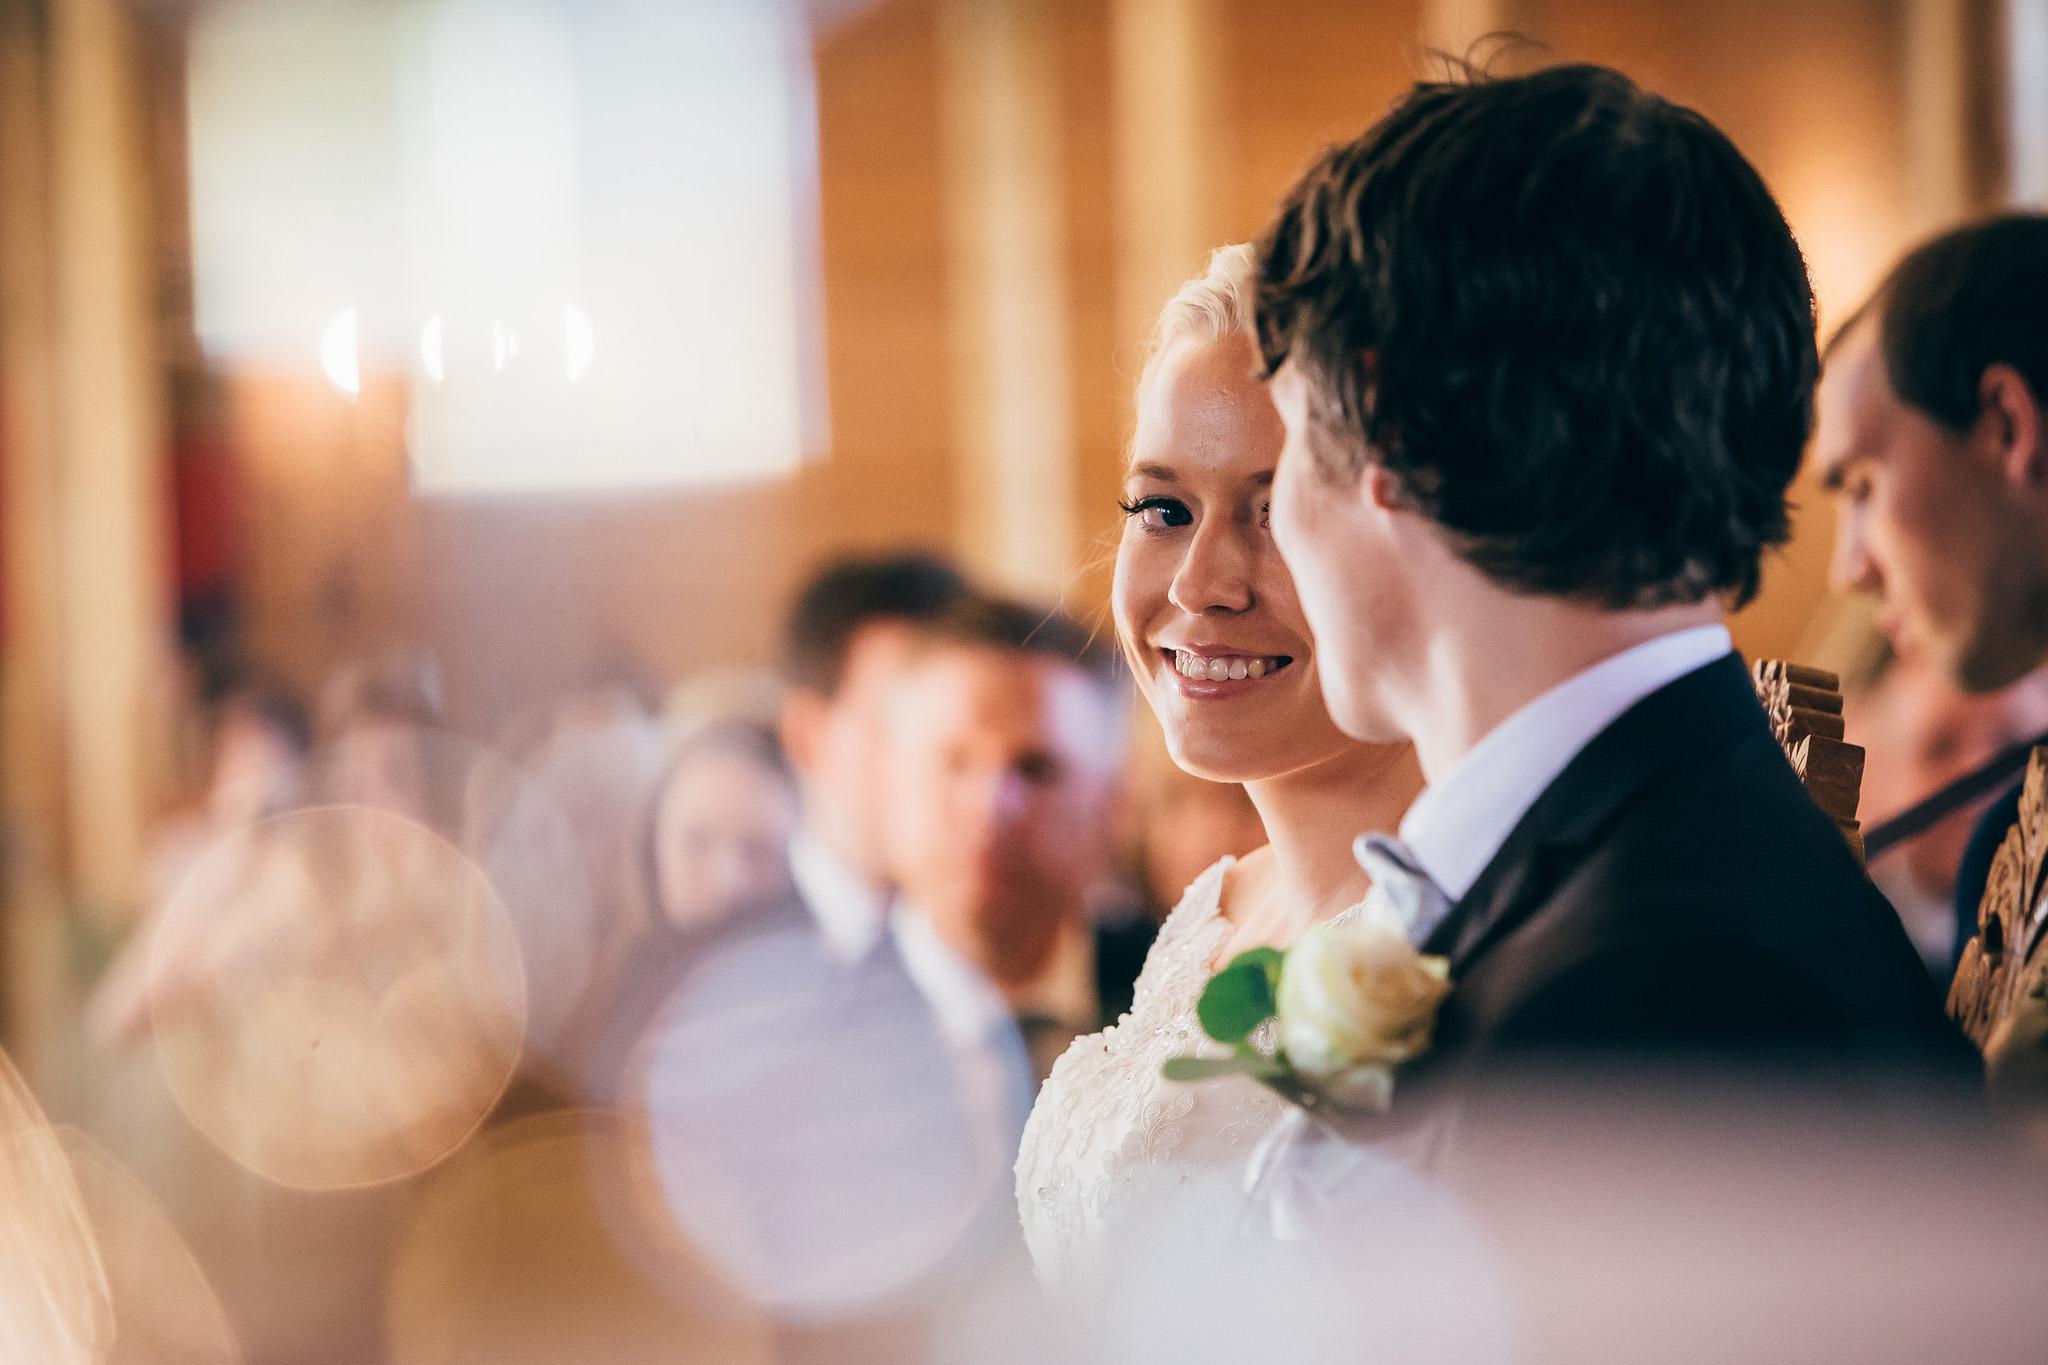 Wedding+Photographer+Norway+Bryllupsfotograf+Casey+Arneson+JT-61.jpg